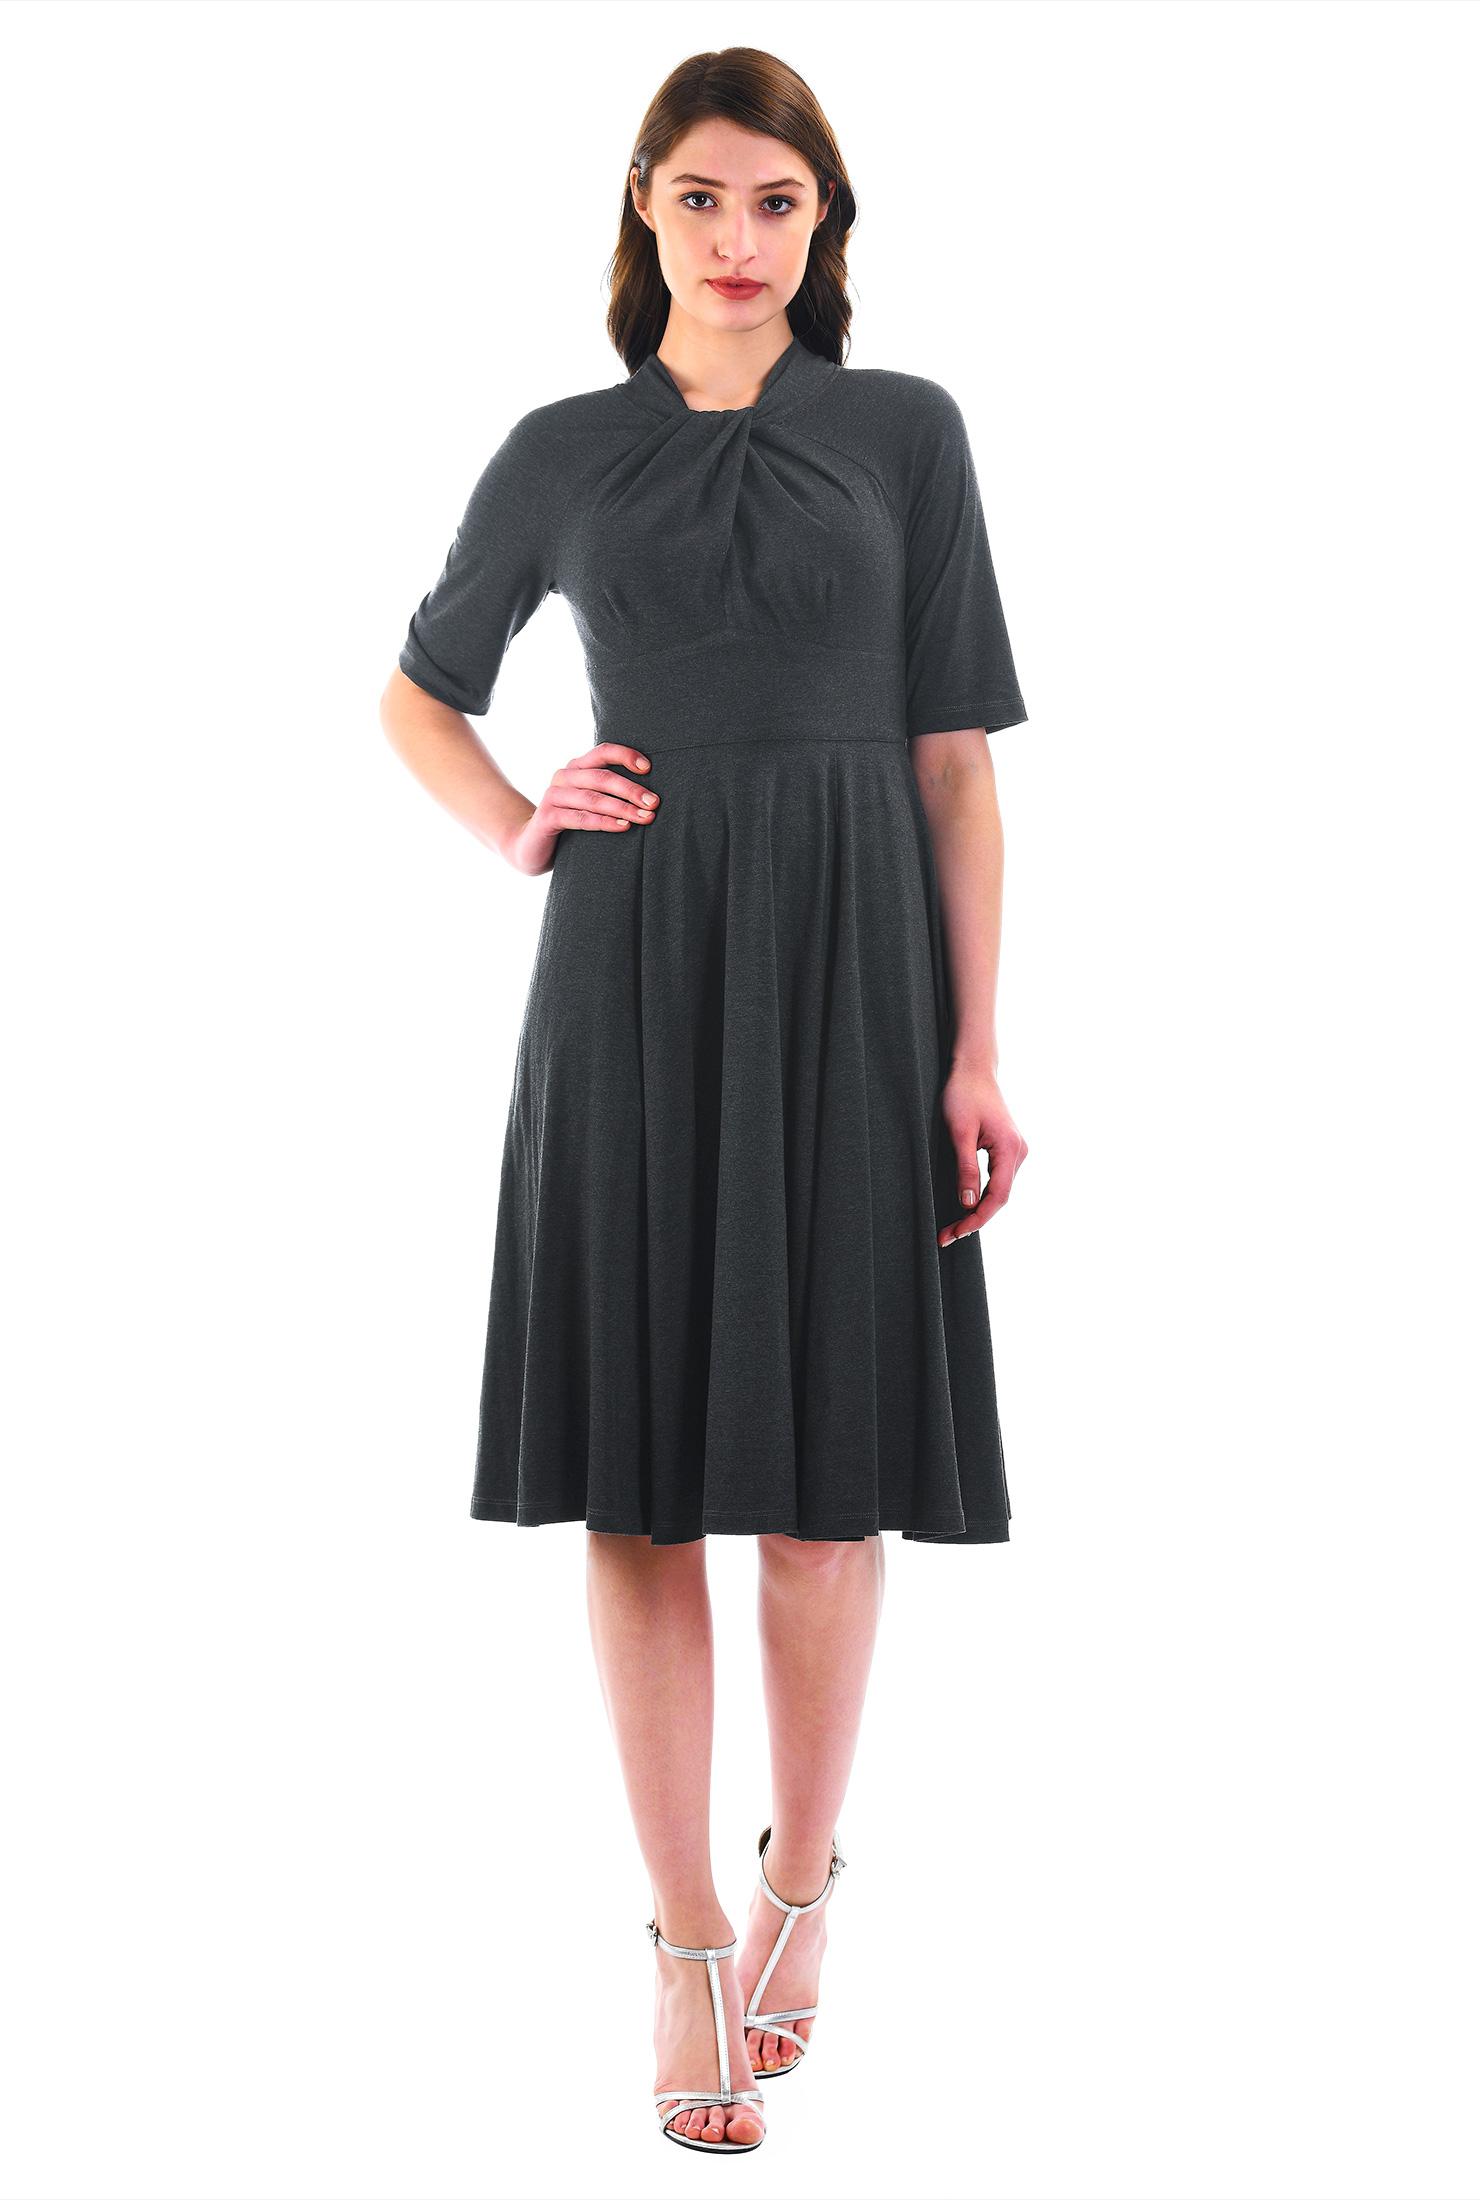 f0002d1082 Women s Fashion Clothing 0-36W and Custom